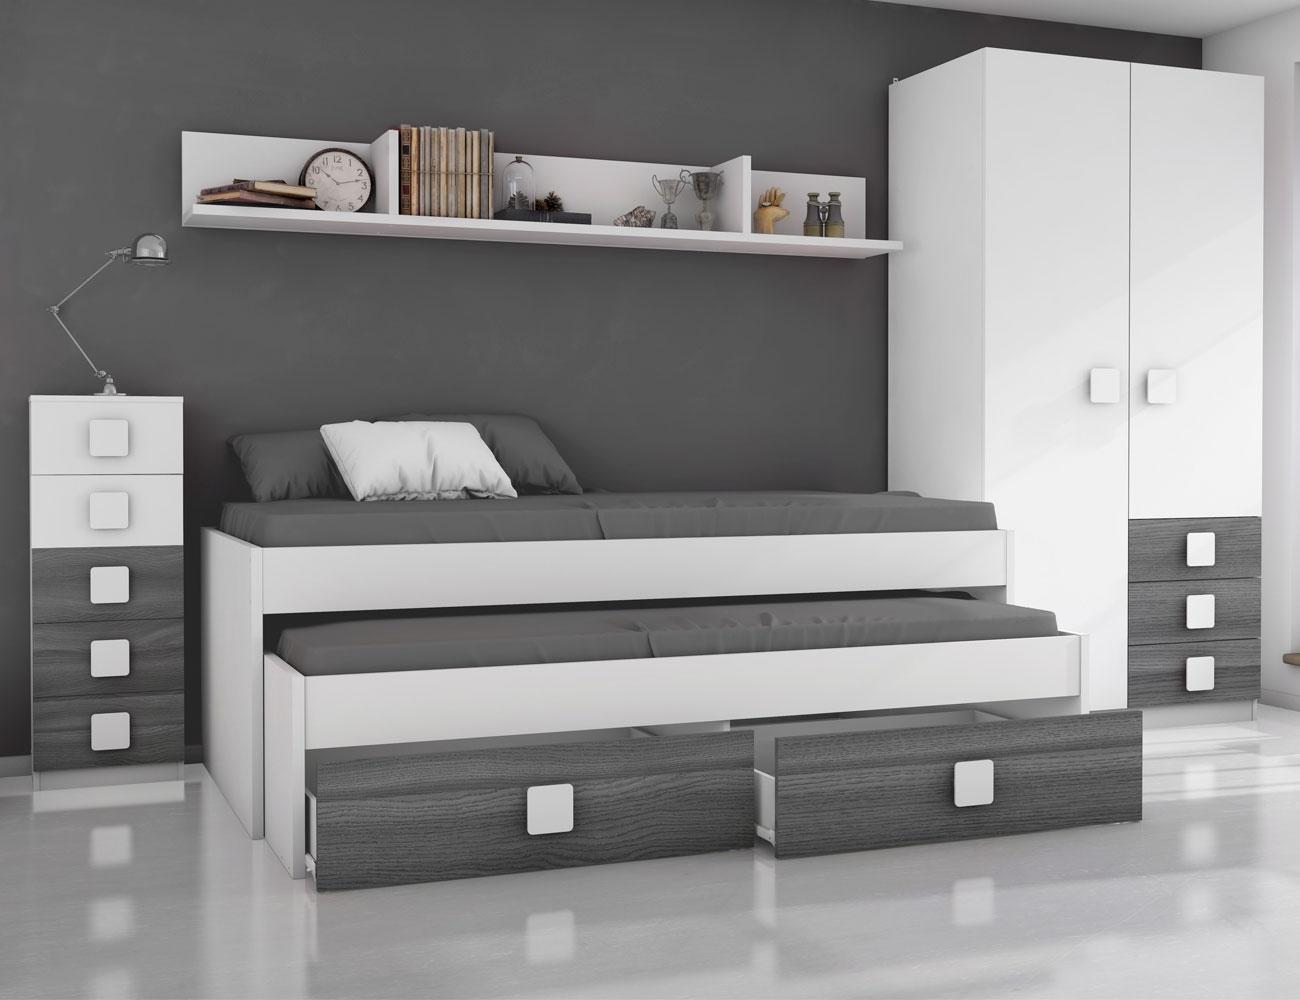 Dormitorio juvenil ceniza blanco6